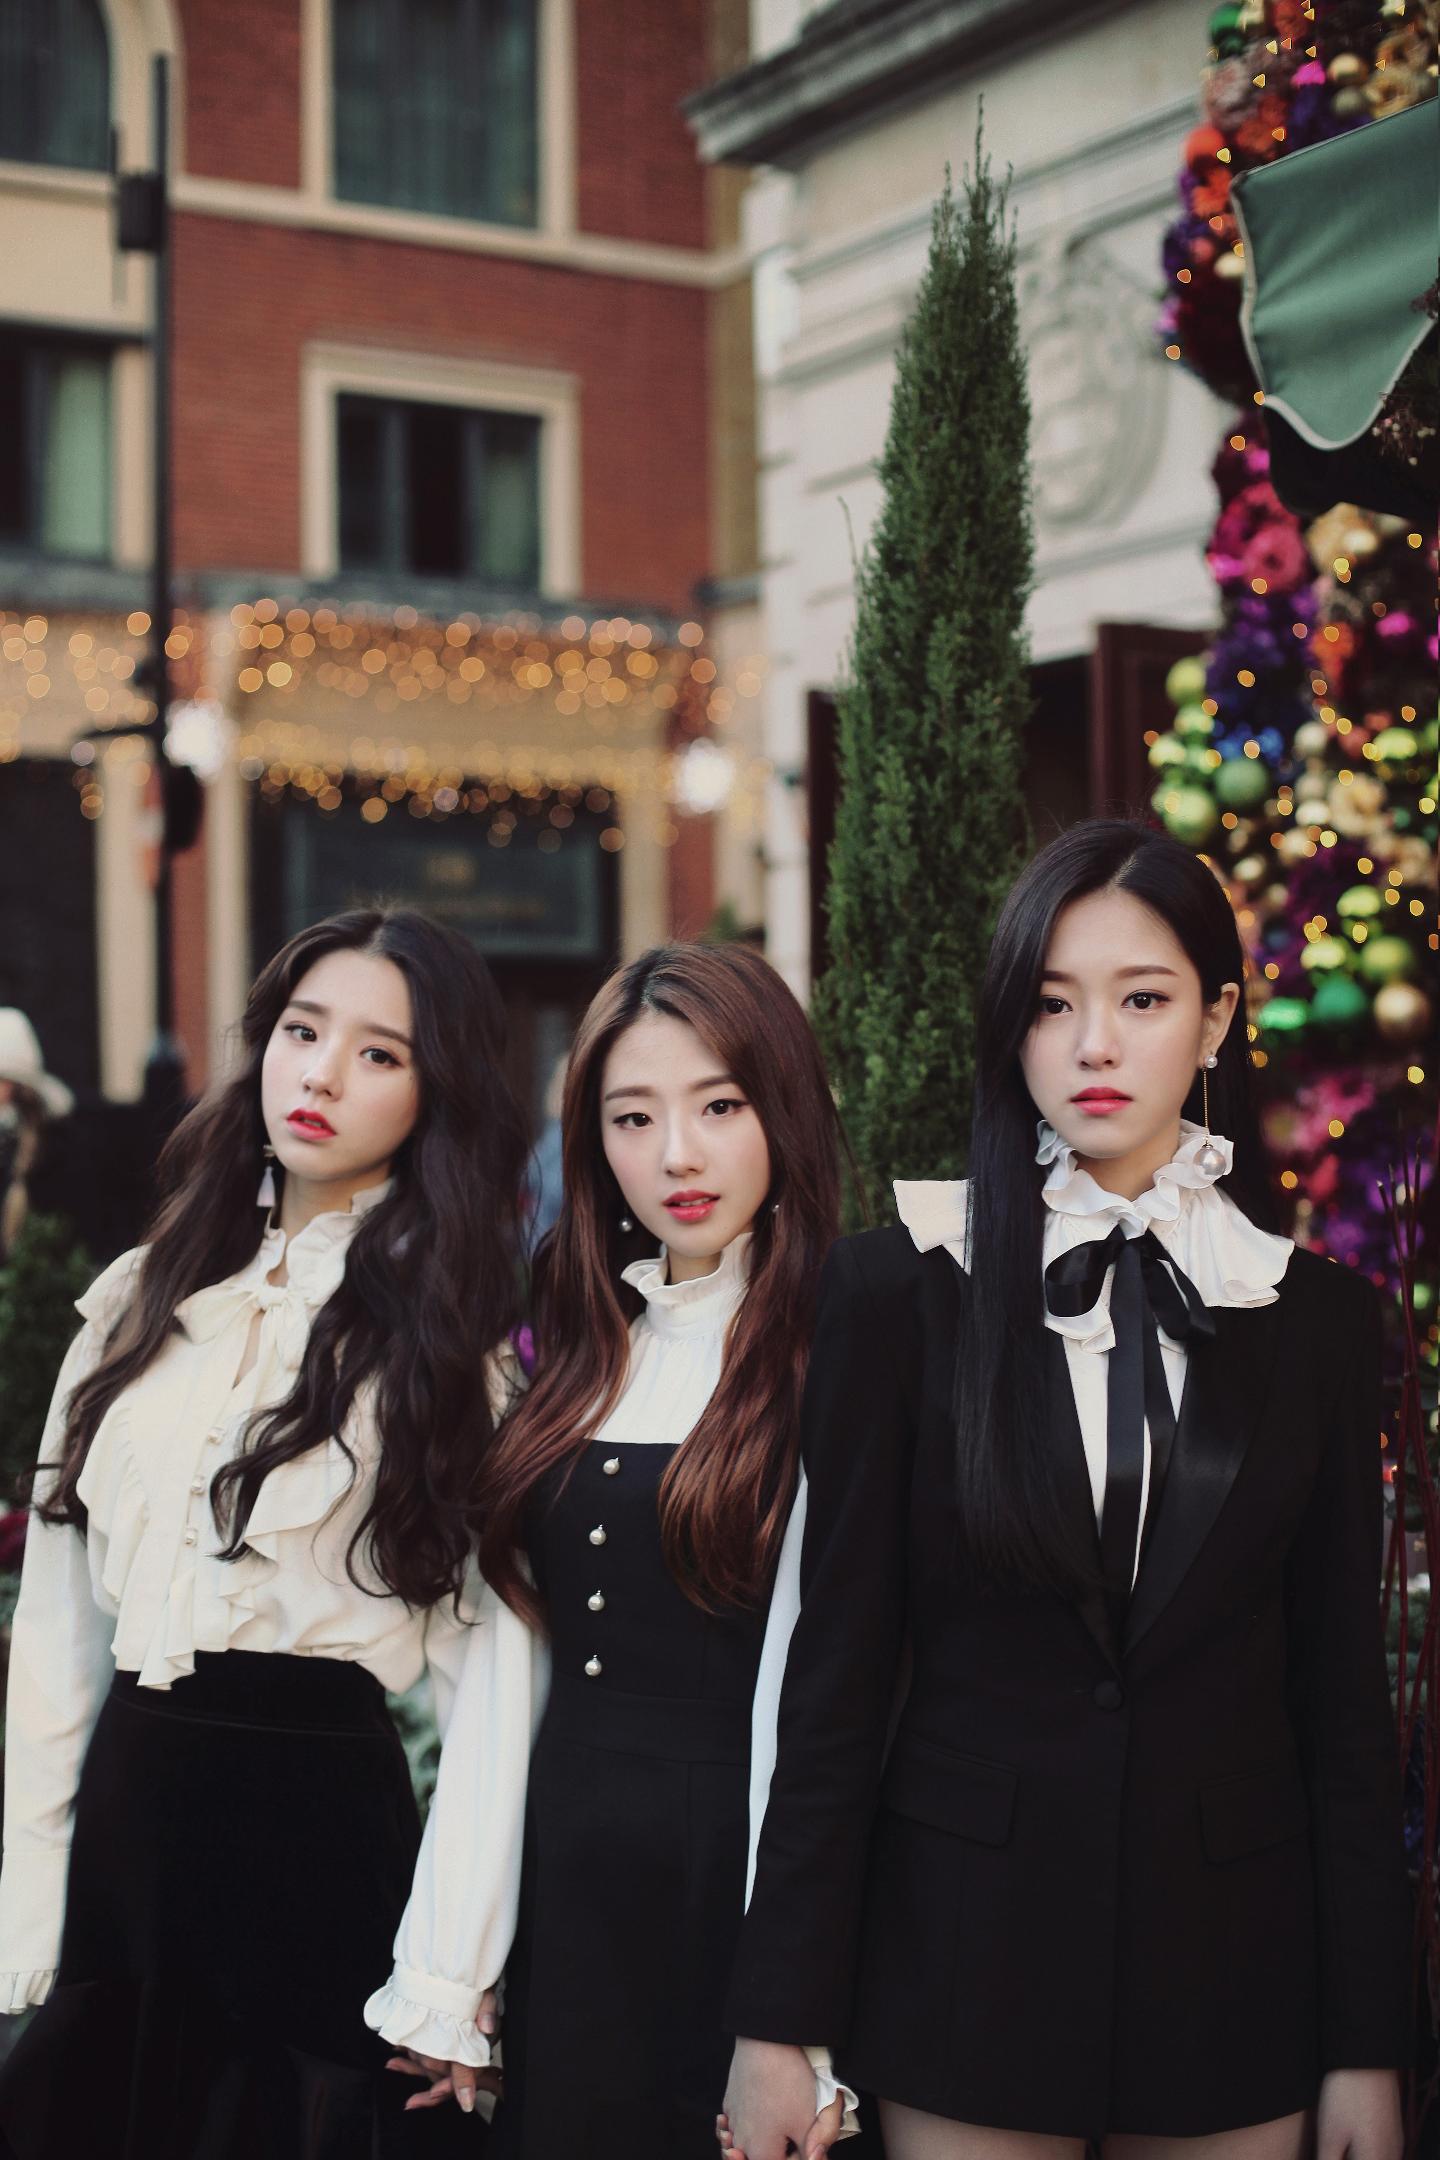 HaSeul single Photocard 4.png